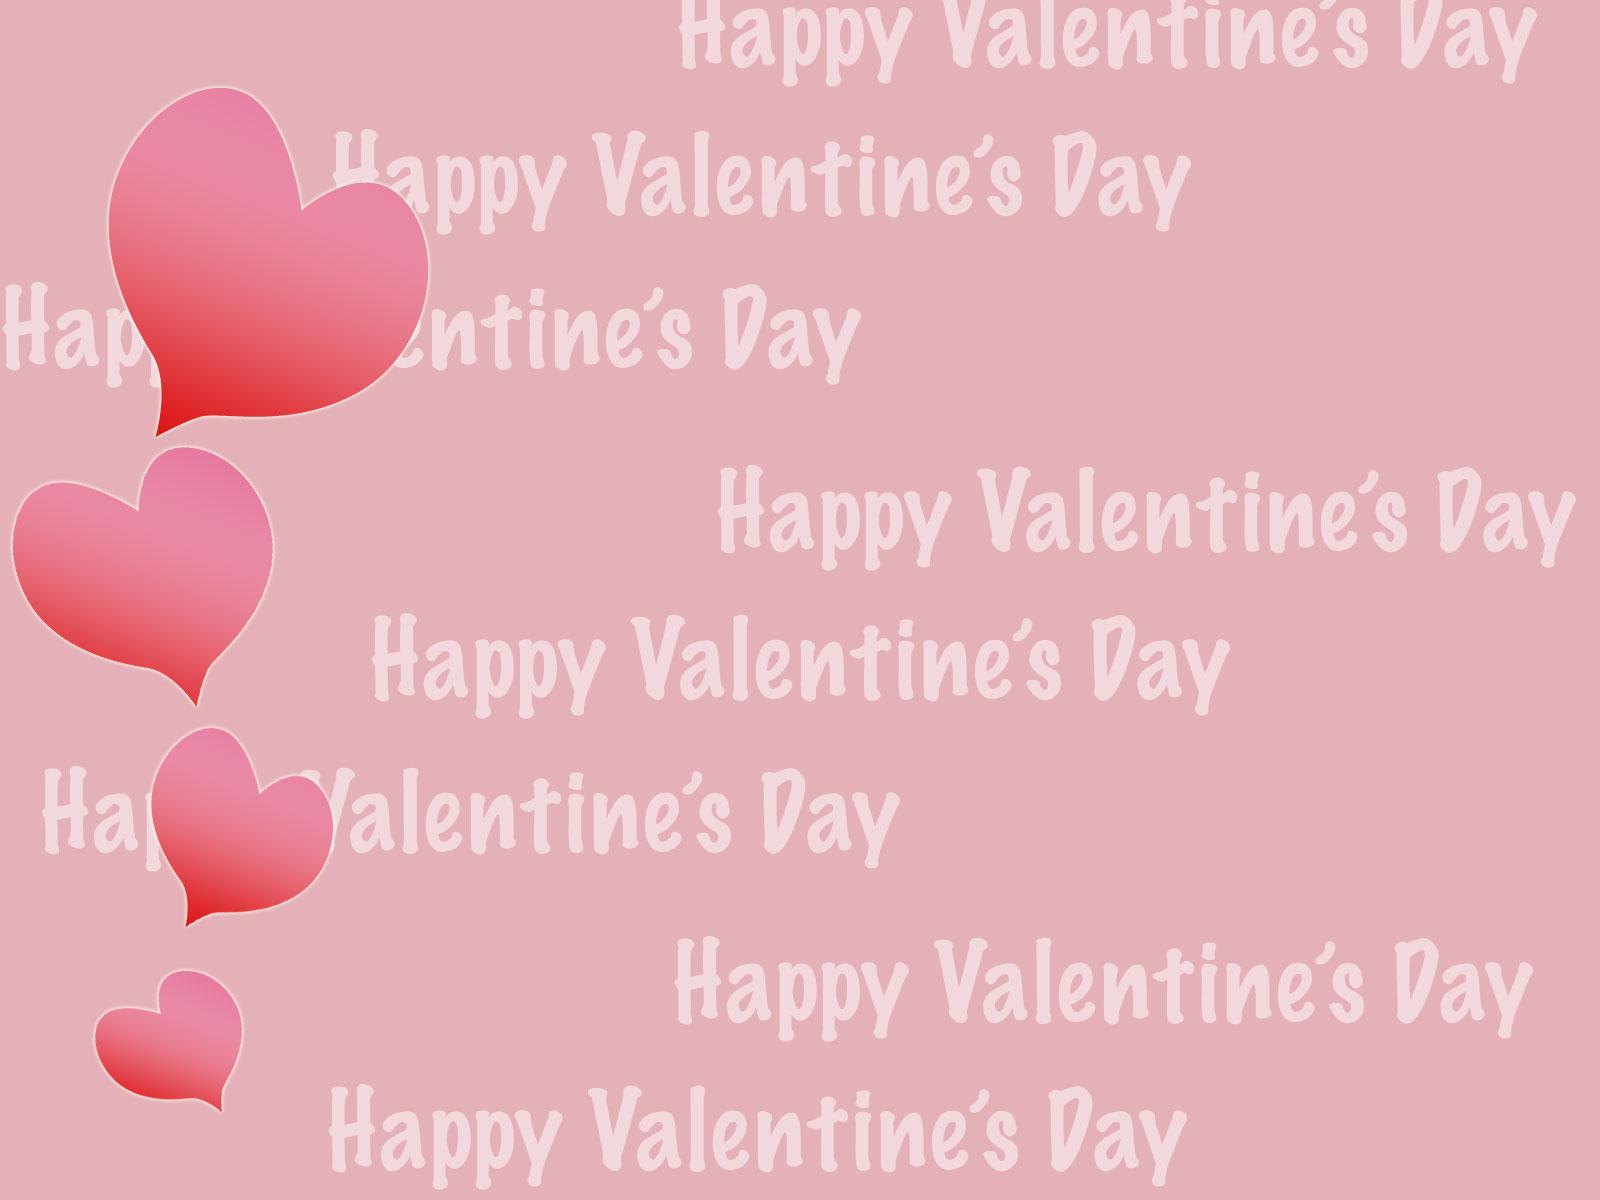 http://4.bp.blogspot.com/-onXjzEbP2ik/TscFPjfkfeI/AAAAAAAAAmI/UfHmexzBQKU/s1600/valentines-day-wallpaper-hd-6-754003.jpg